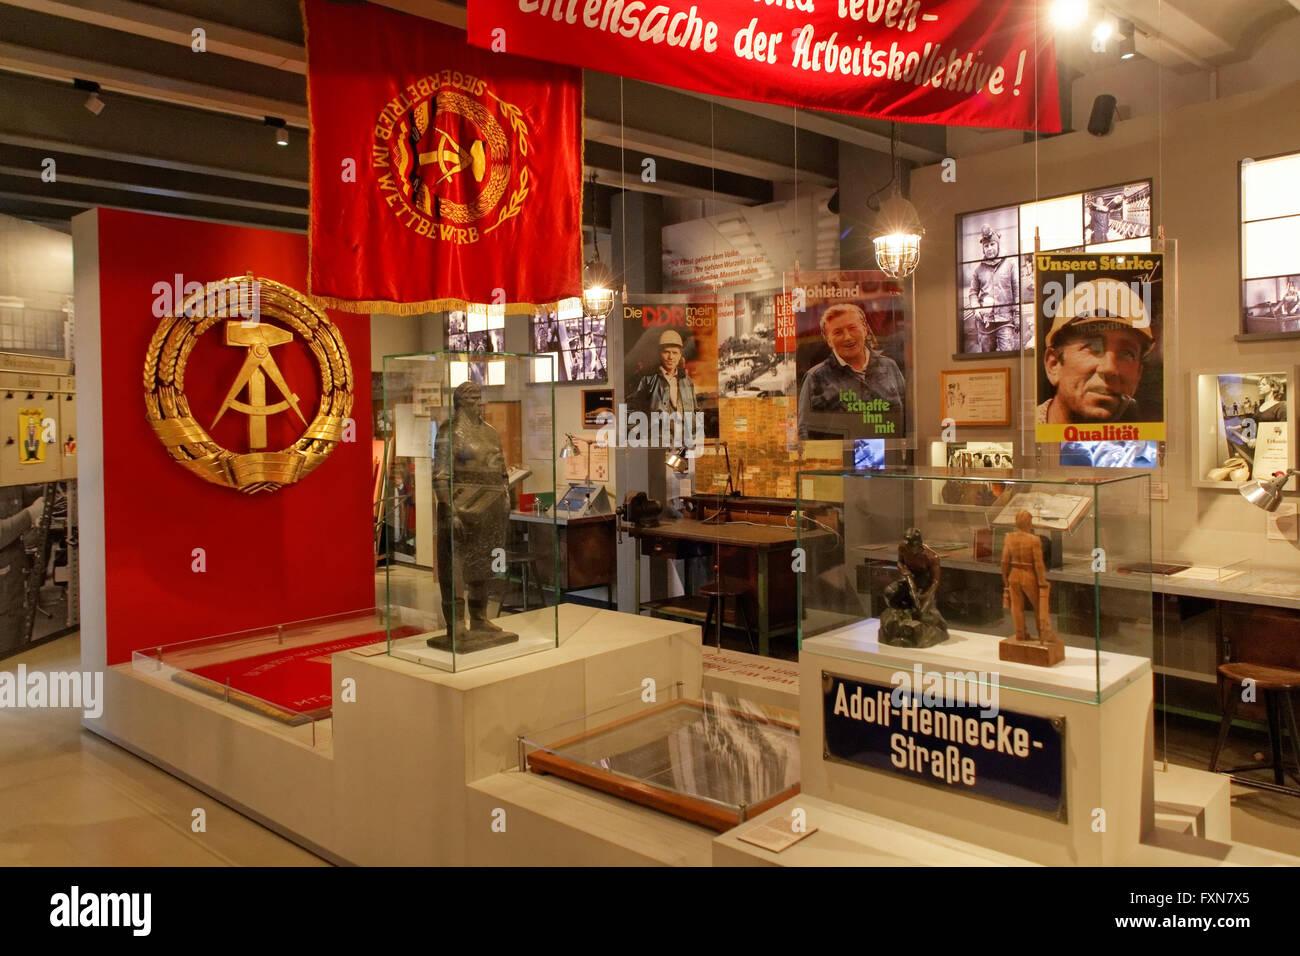 DDR Museum in der Kulturbrauerei Prenzlauer Berg, Berlin, Deutschland - Stock Image